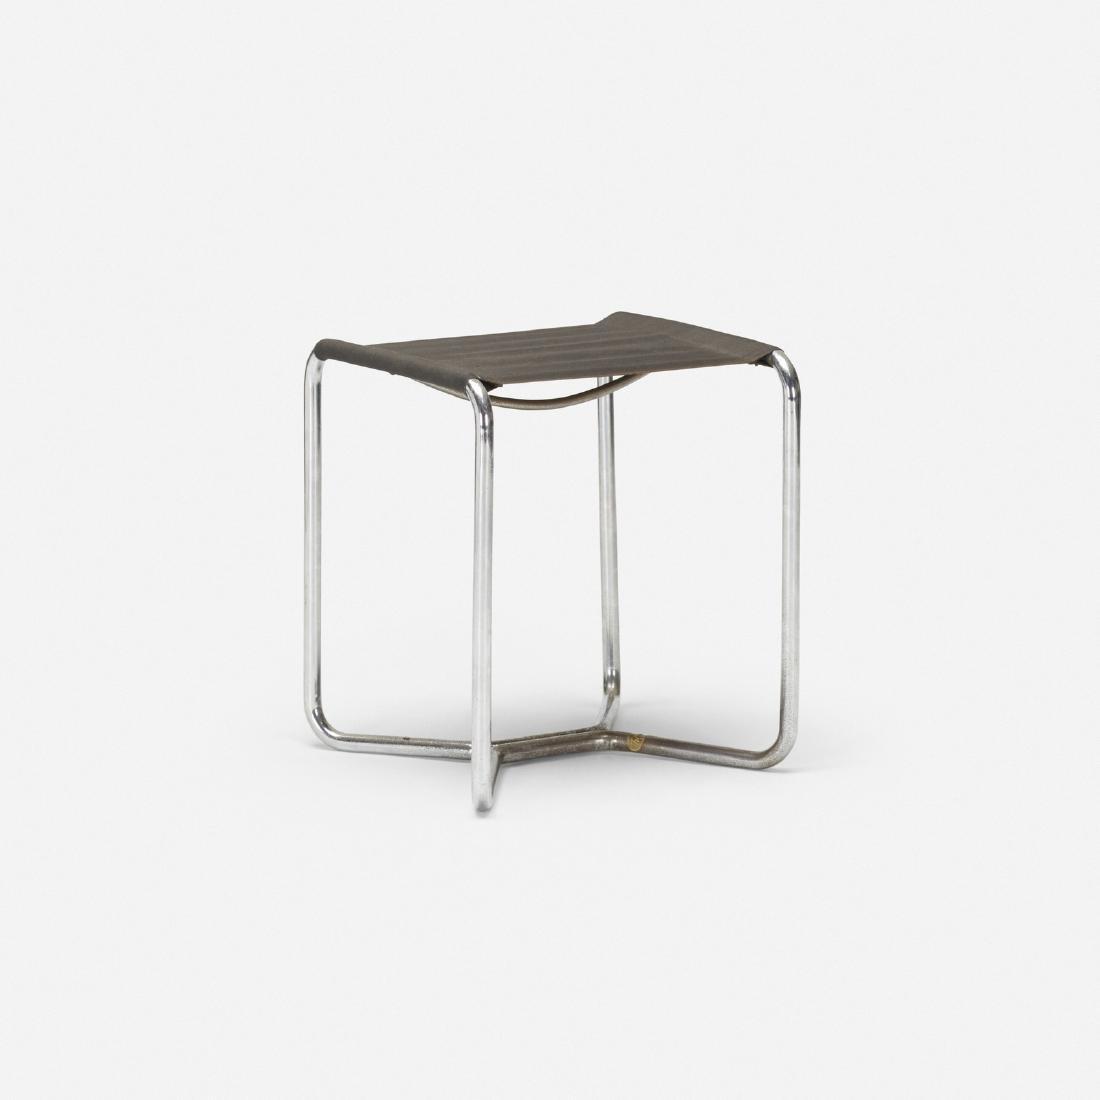 Marcel Breuer, B8 stool